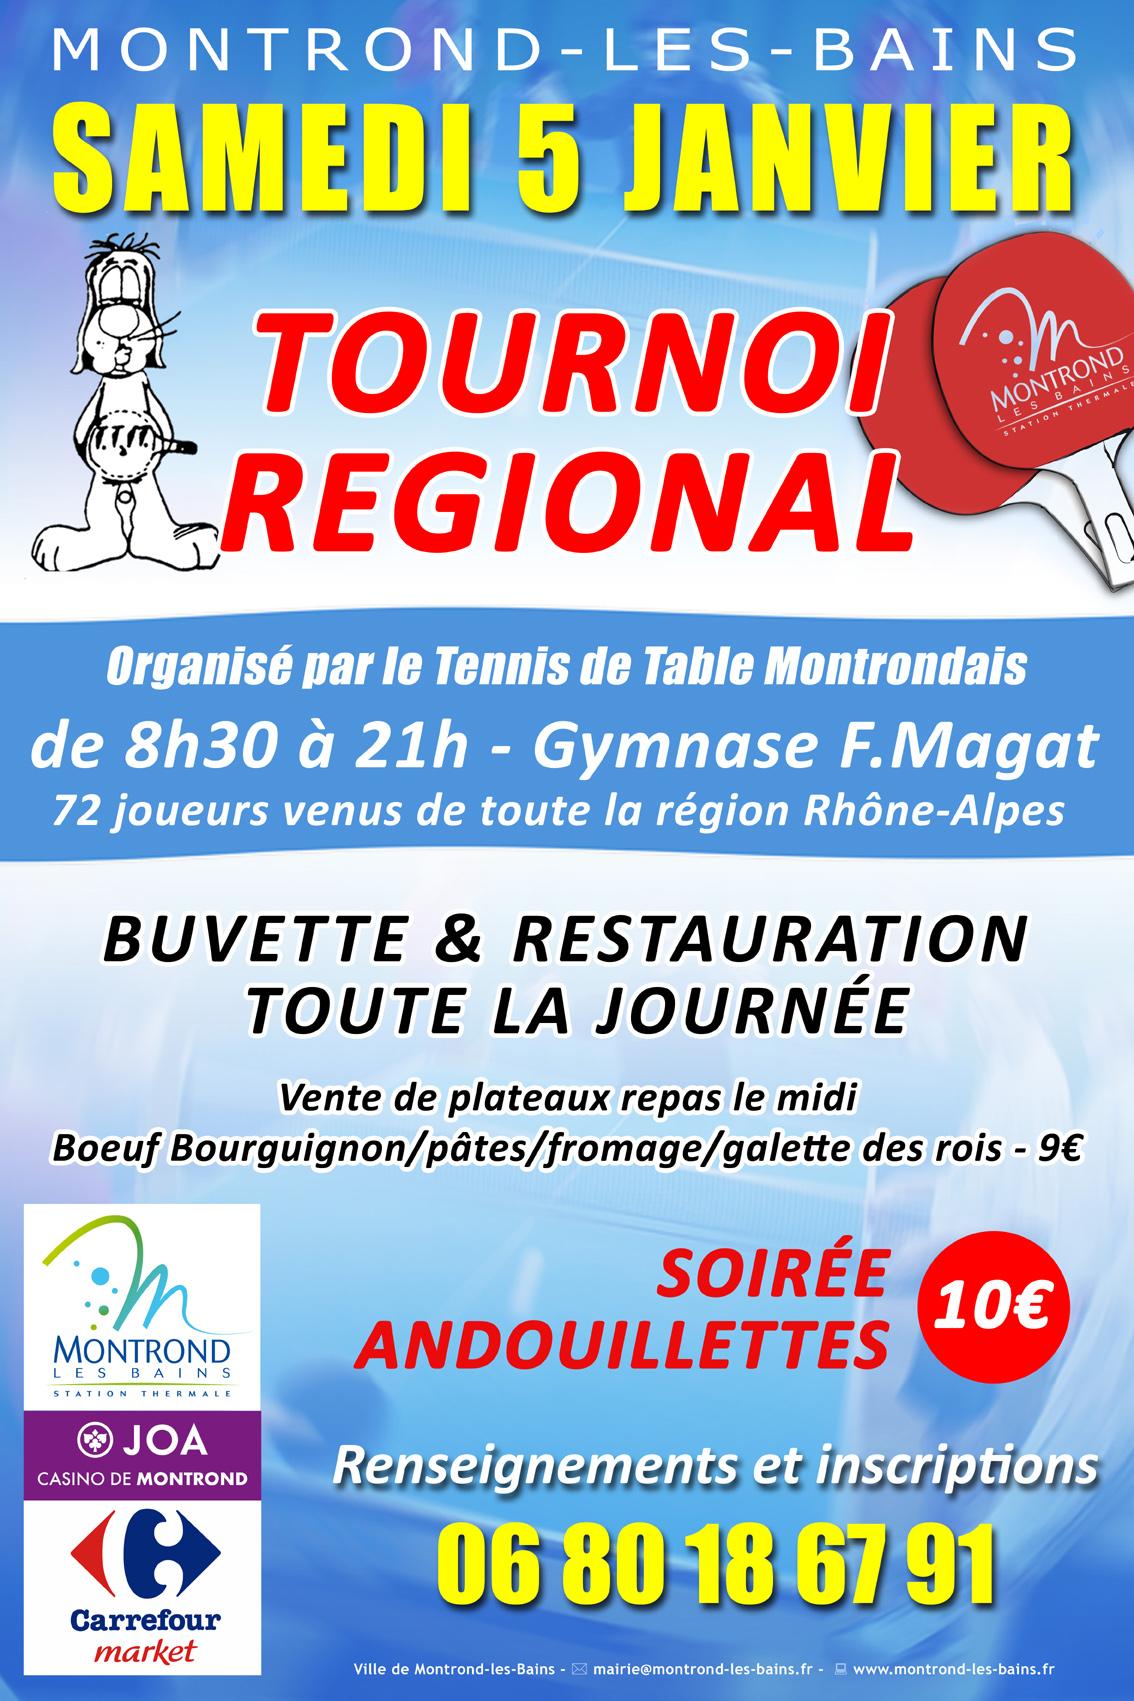 http://montrondtt.free.fr/Affiche%20cybercentre%20tournoi%20de%20Noel%20petite.jpg